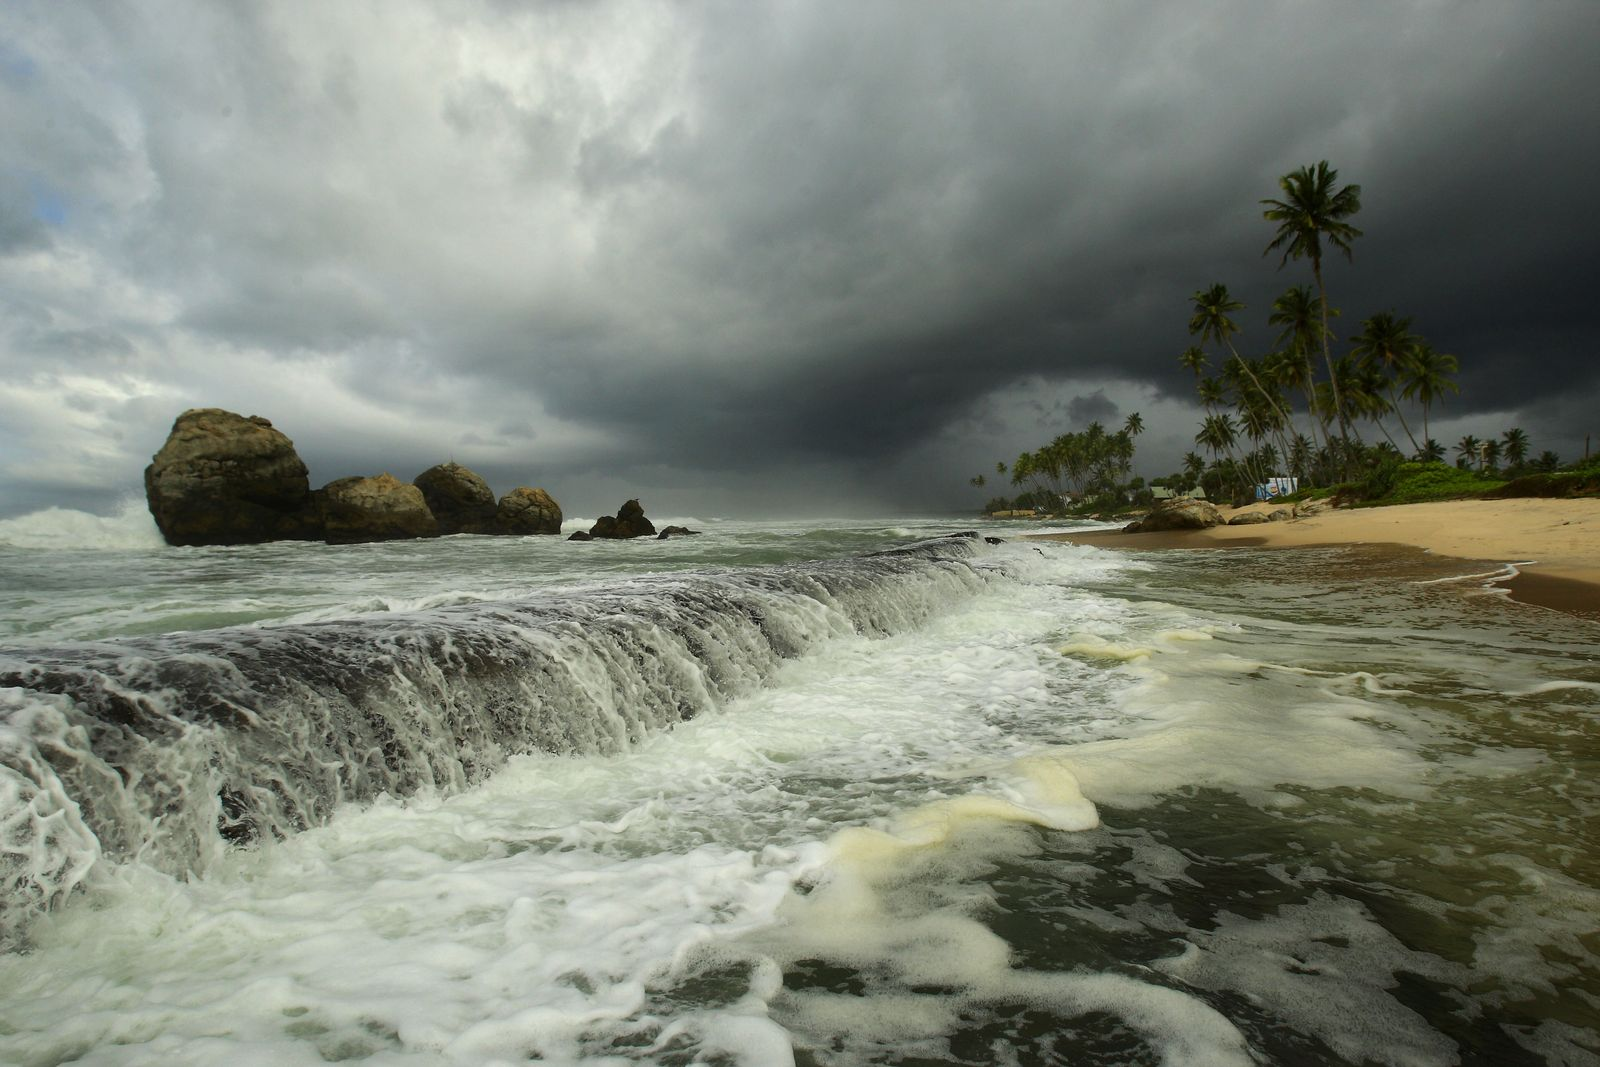 Monsun / Sri Lanka / IPCC 2011